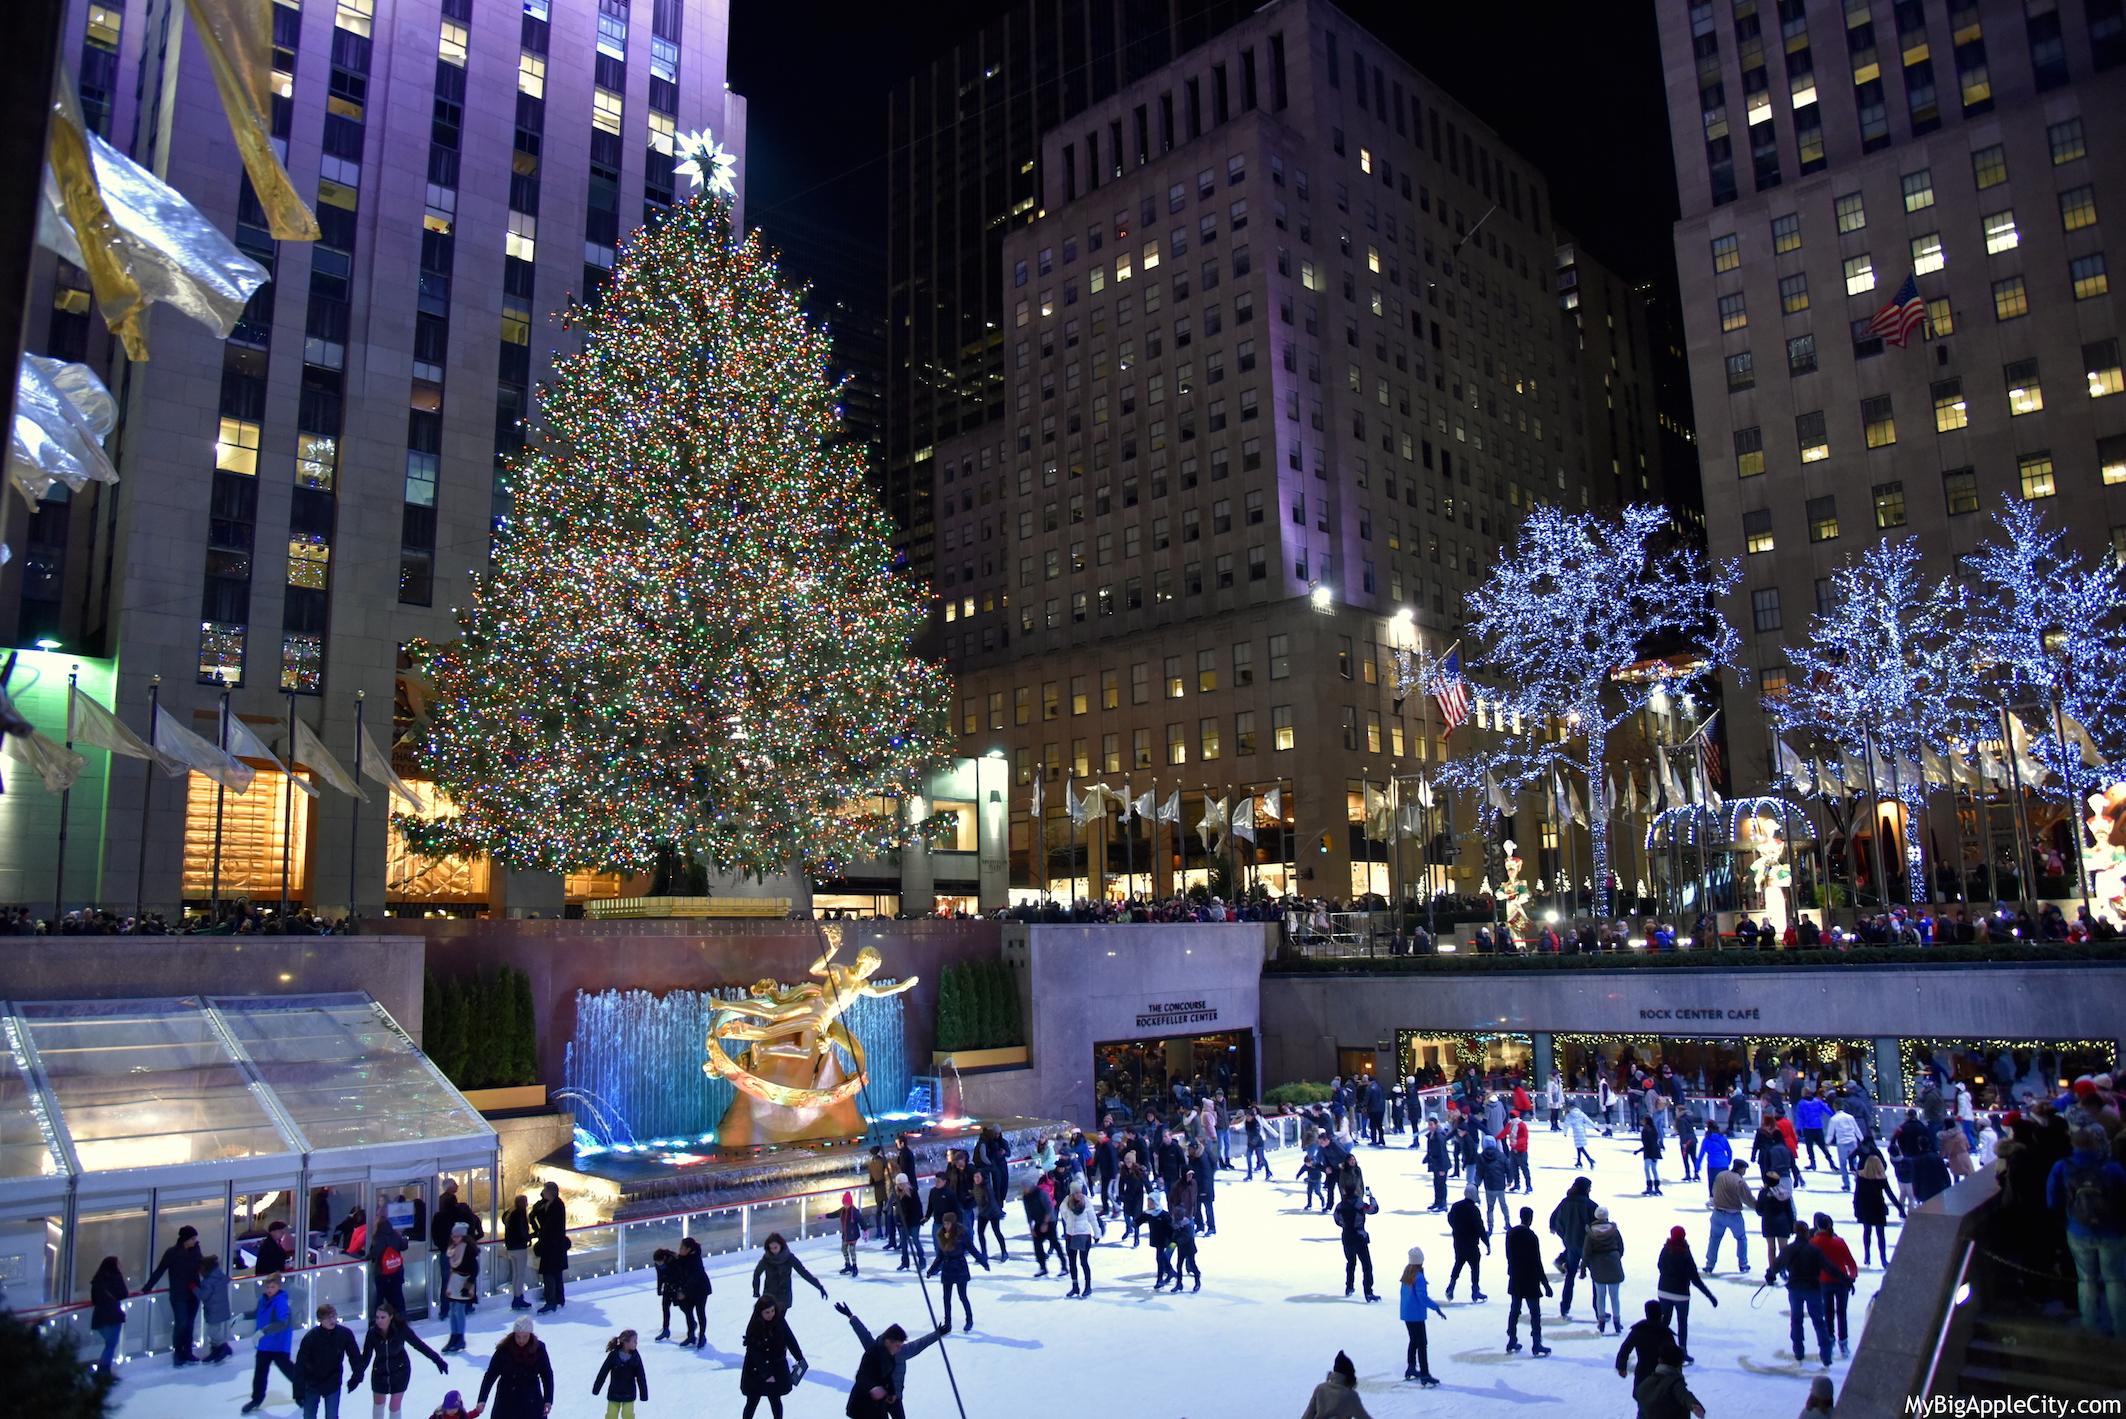 Christmas-in-New-York-manhattan-rock-center-MyBigAppleCity